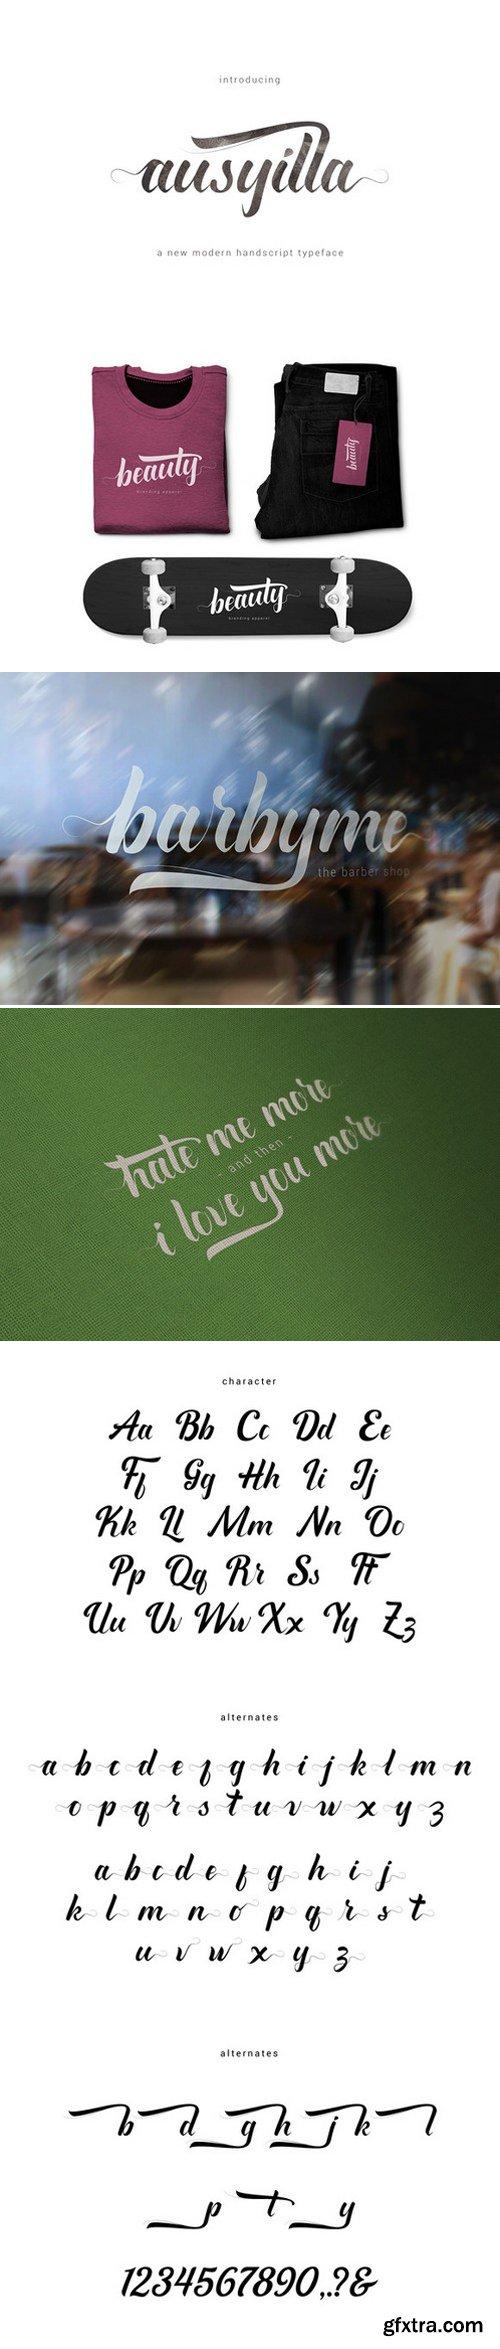 CM - Ausyilla Typeface 434037